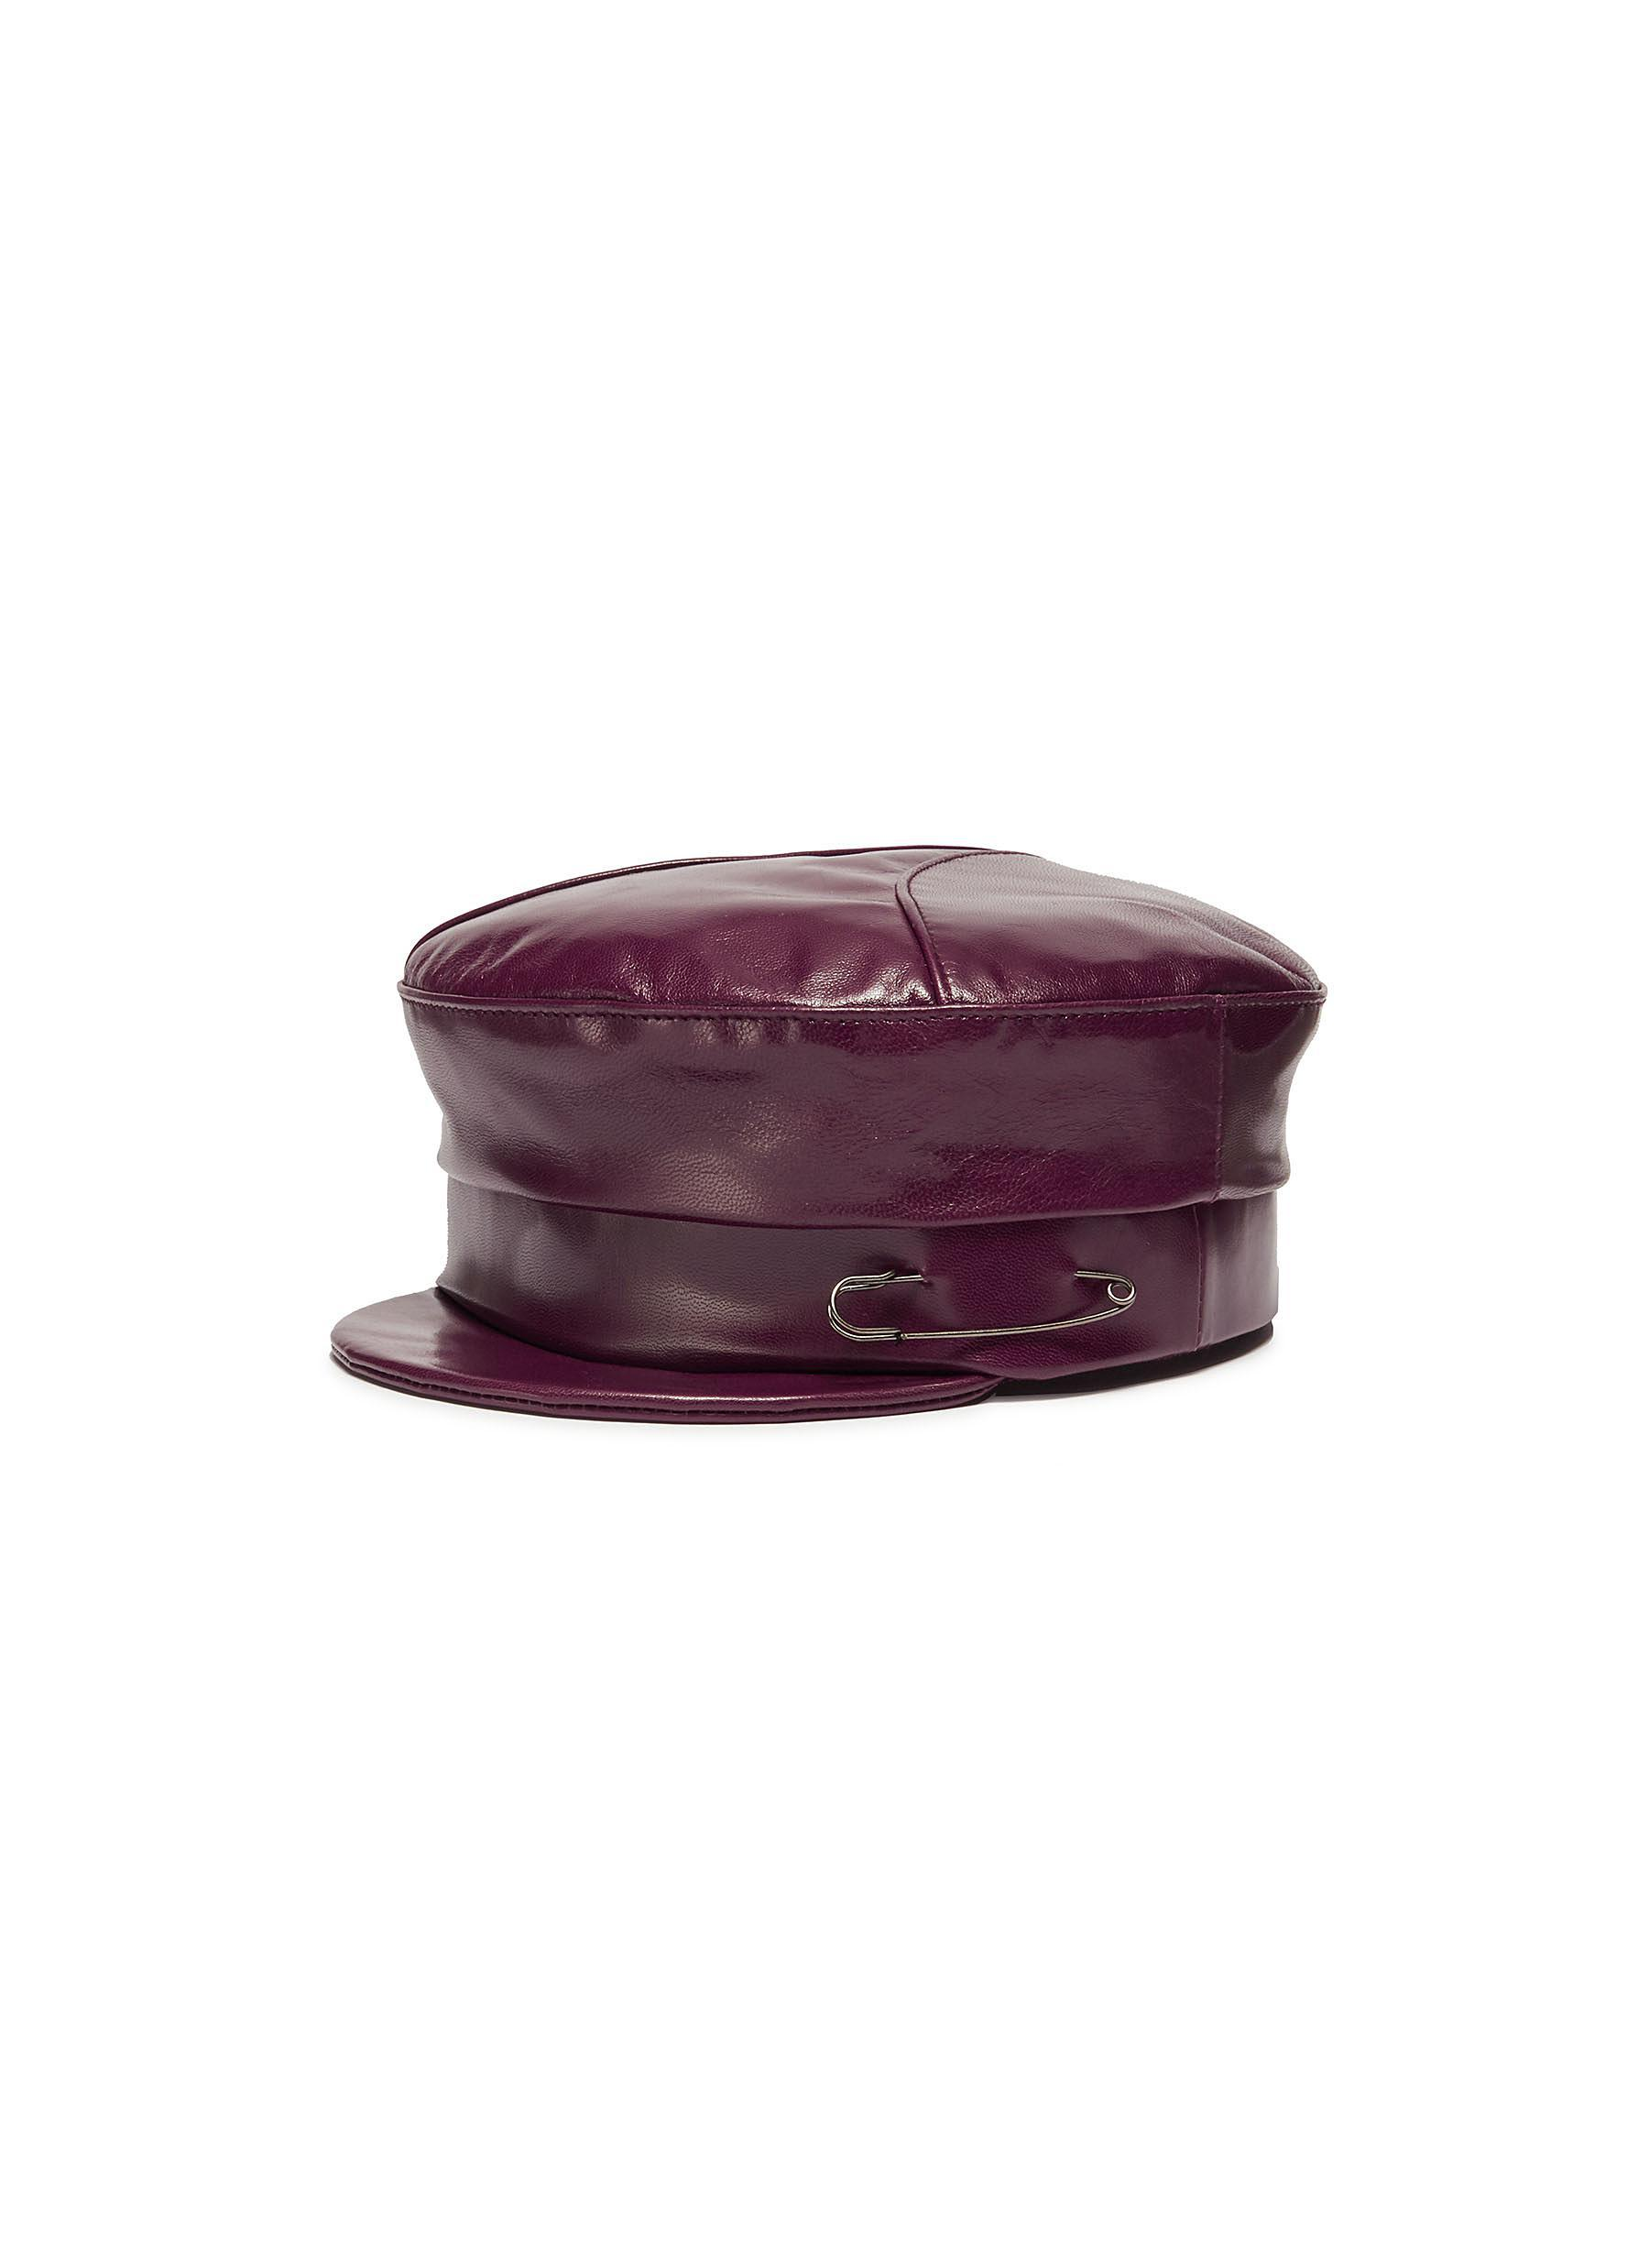 Lyst - Gigi Burris Millinery  georgie  Leather Newsboy Cap in Purple cac4d1863c03